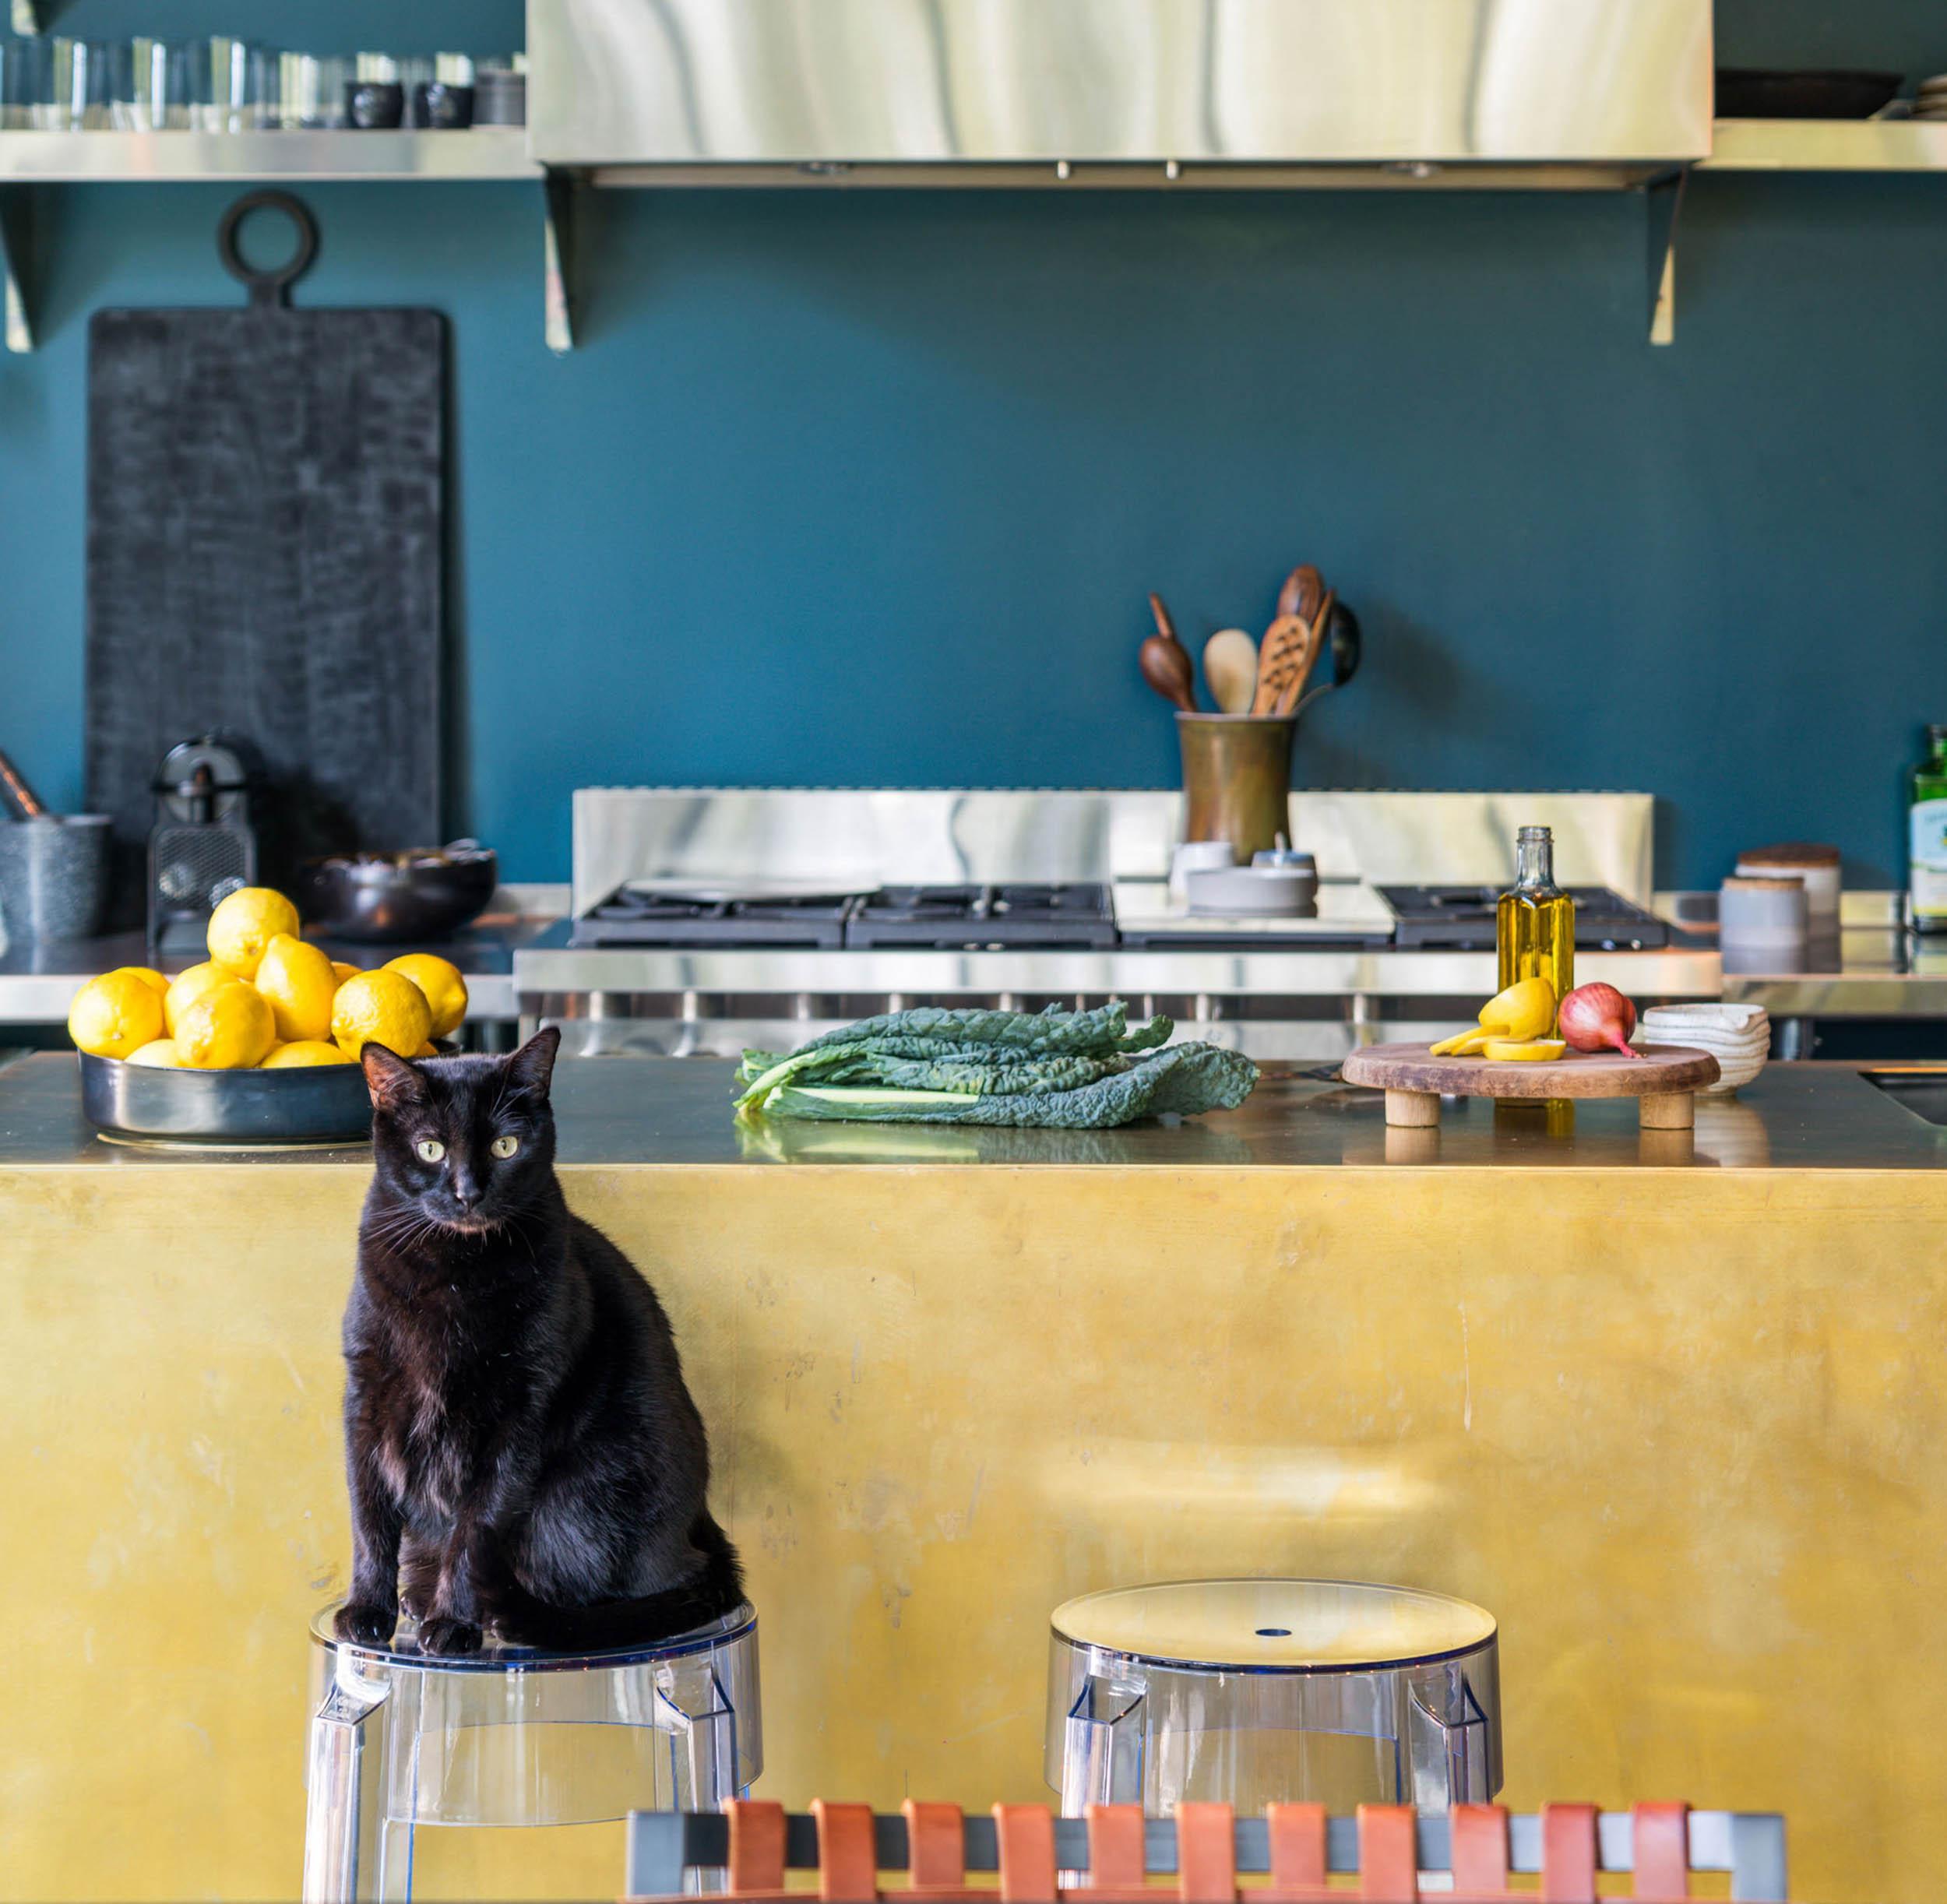 cat sitting on stool in modern kitchen